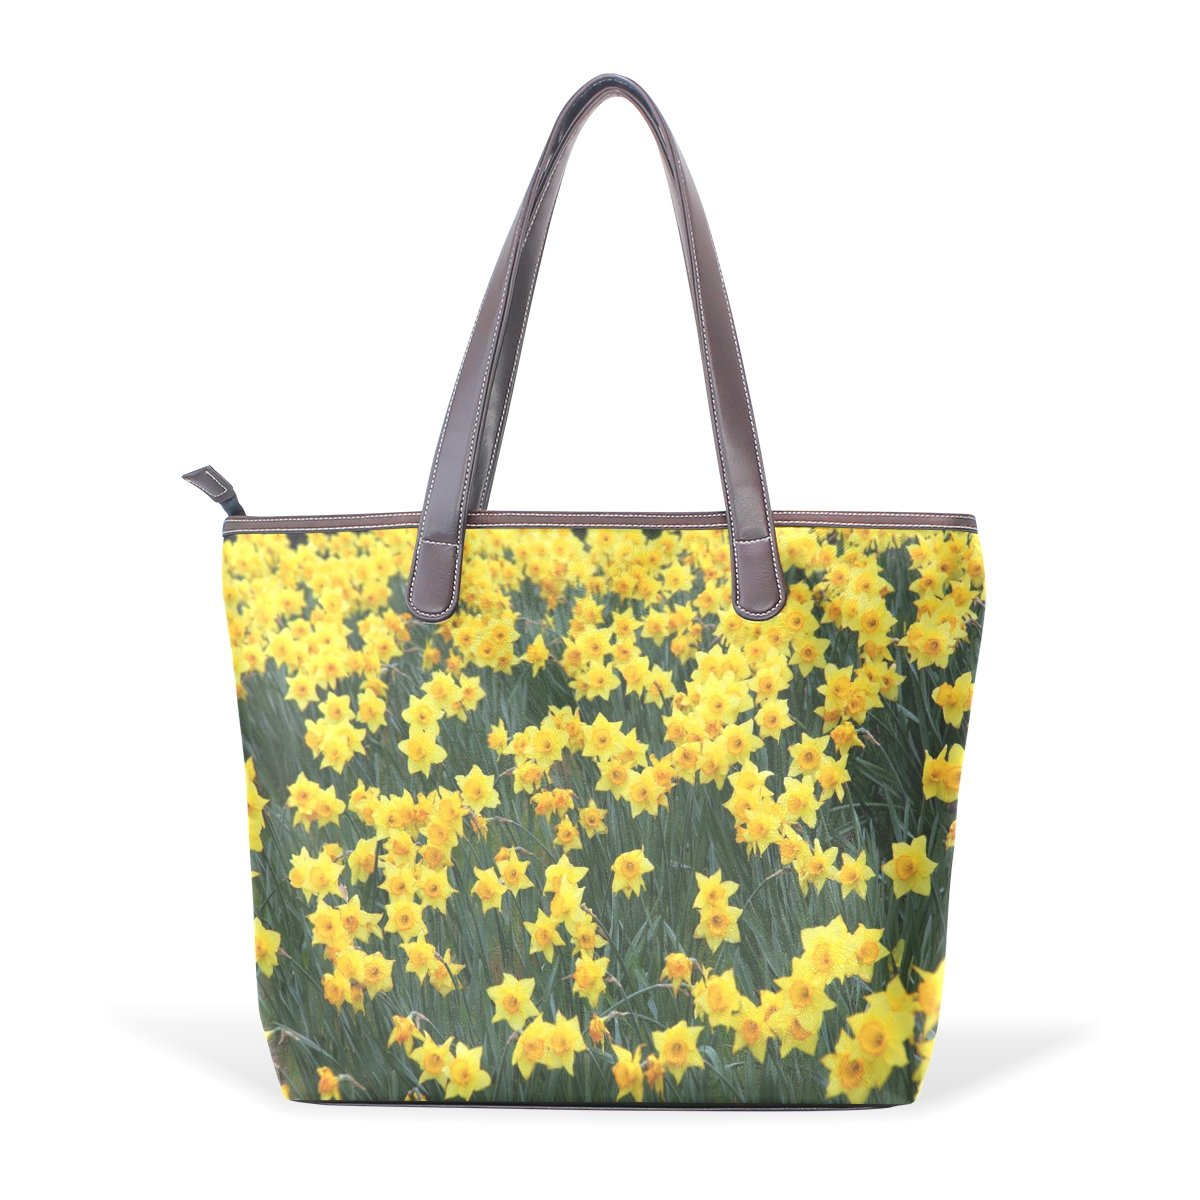 Ye Store Field Yellow Daffodil Flowers Lady PU Leather Handbag Tote Bag Shoulder Bag Shopping Bag